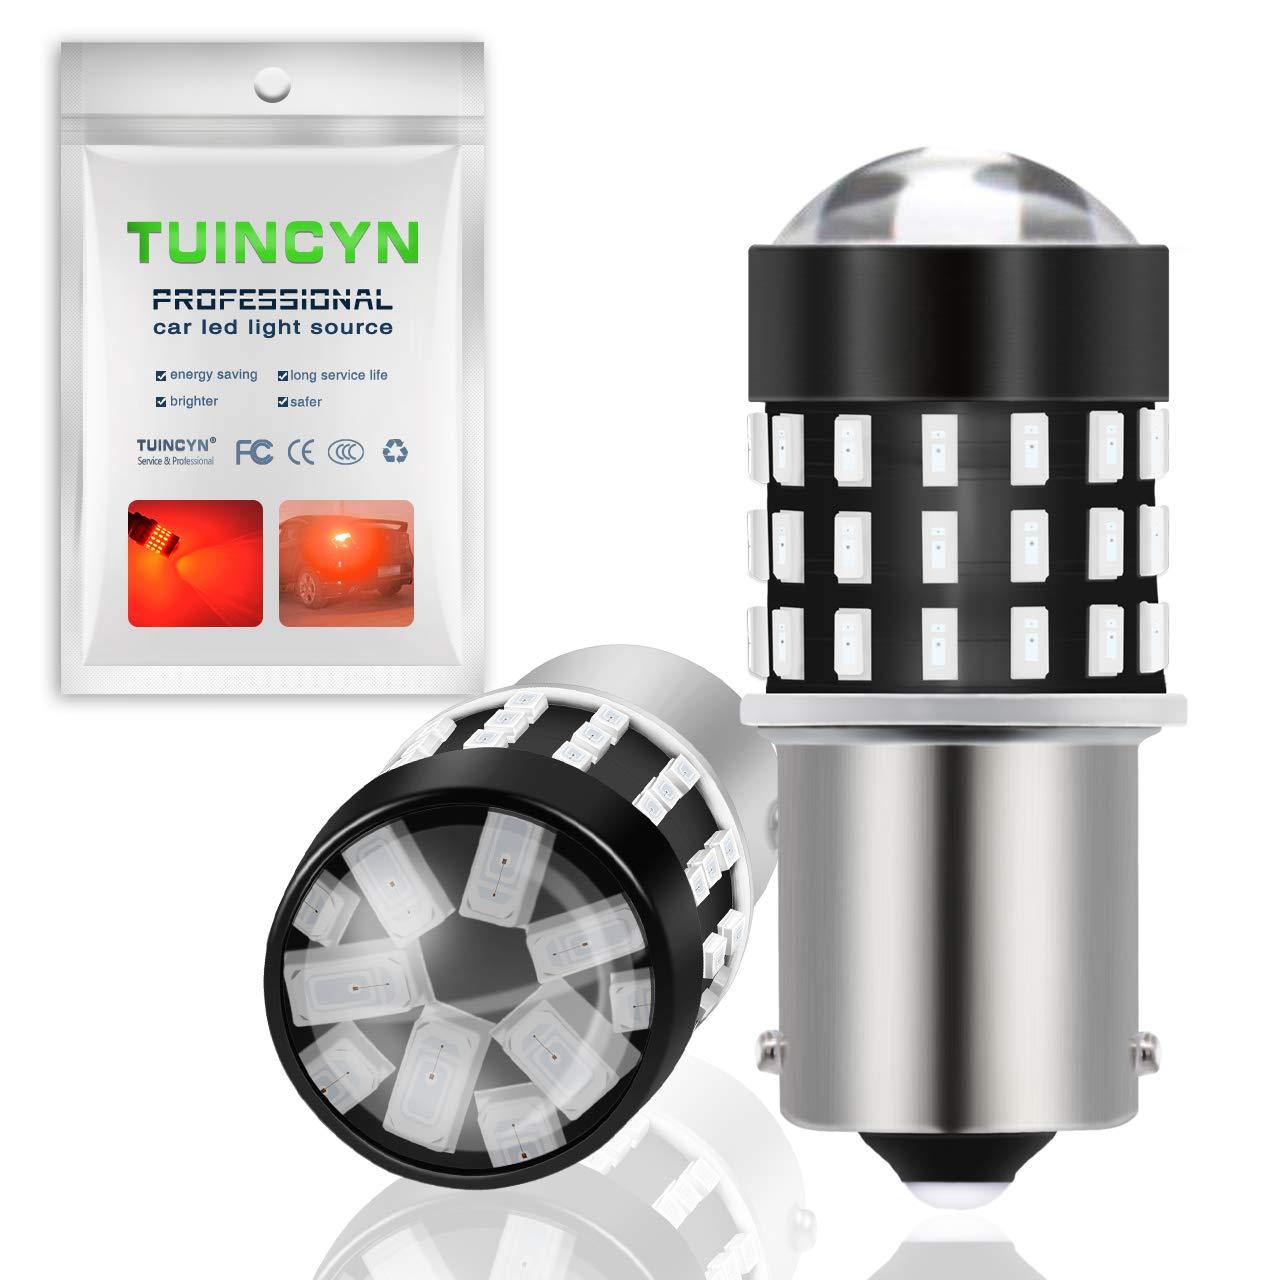 TUINCYN 800 Lumens 921 912 W16W T15 Brake Light Bulb Red 15SMD 2835 Turn Signal Backup Reverse Tail Lights Parking LED Bulbs DC 12V Pack of 2